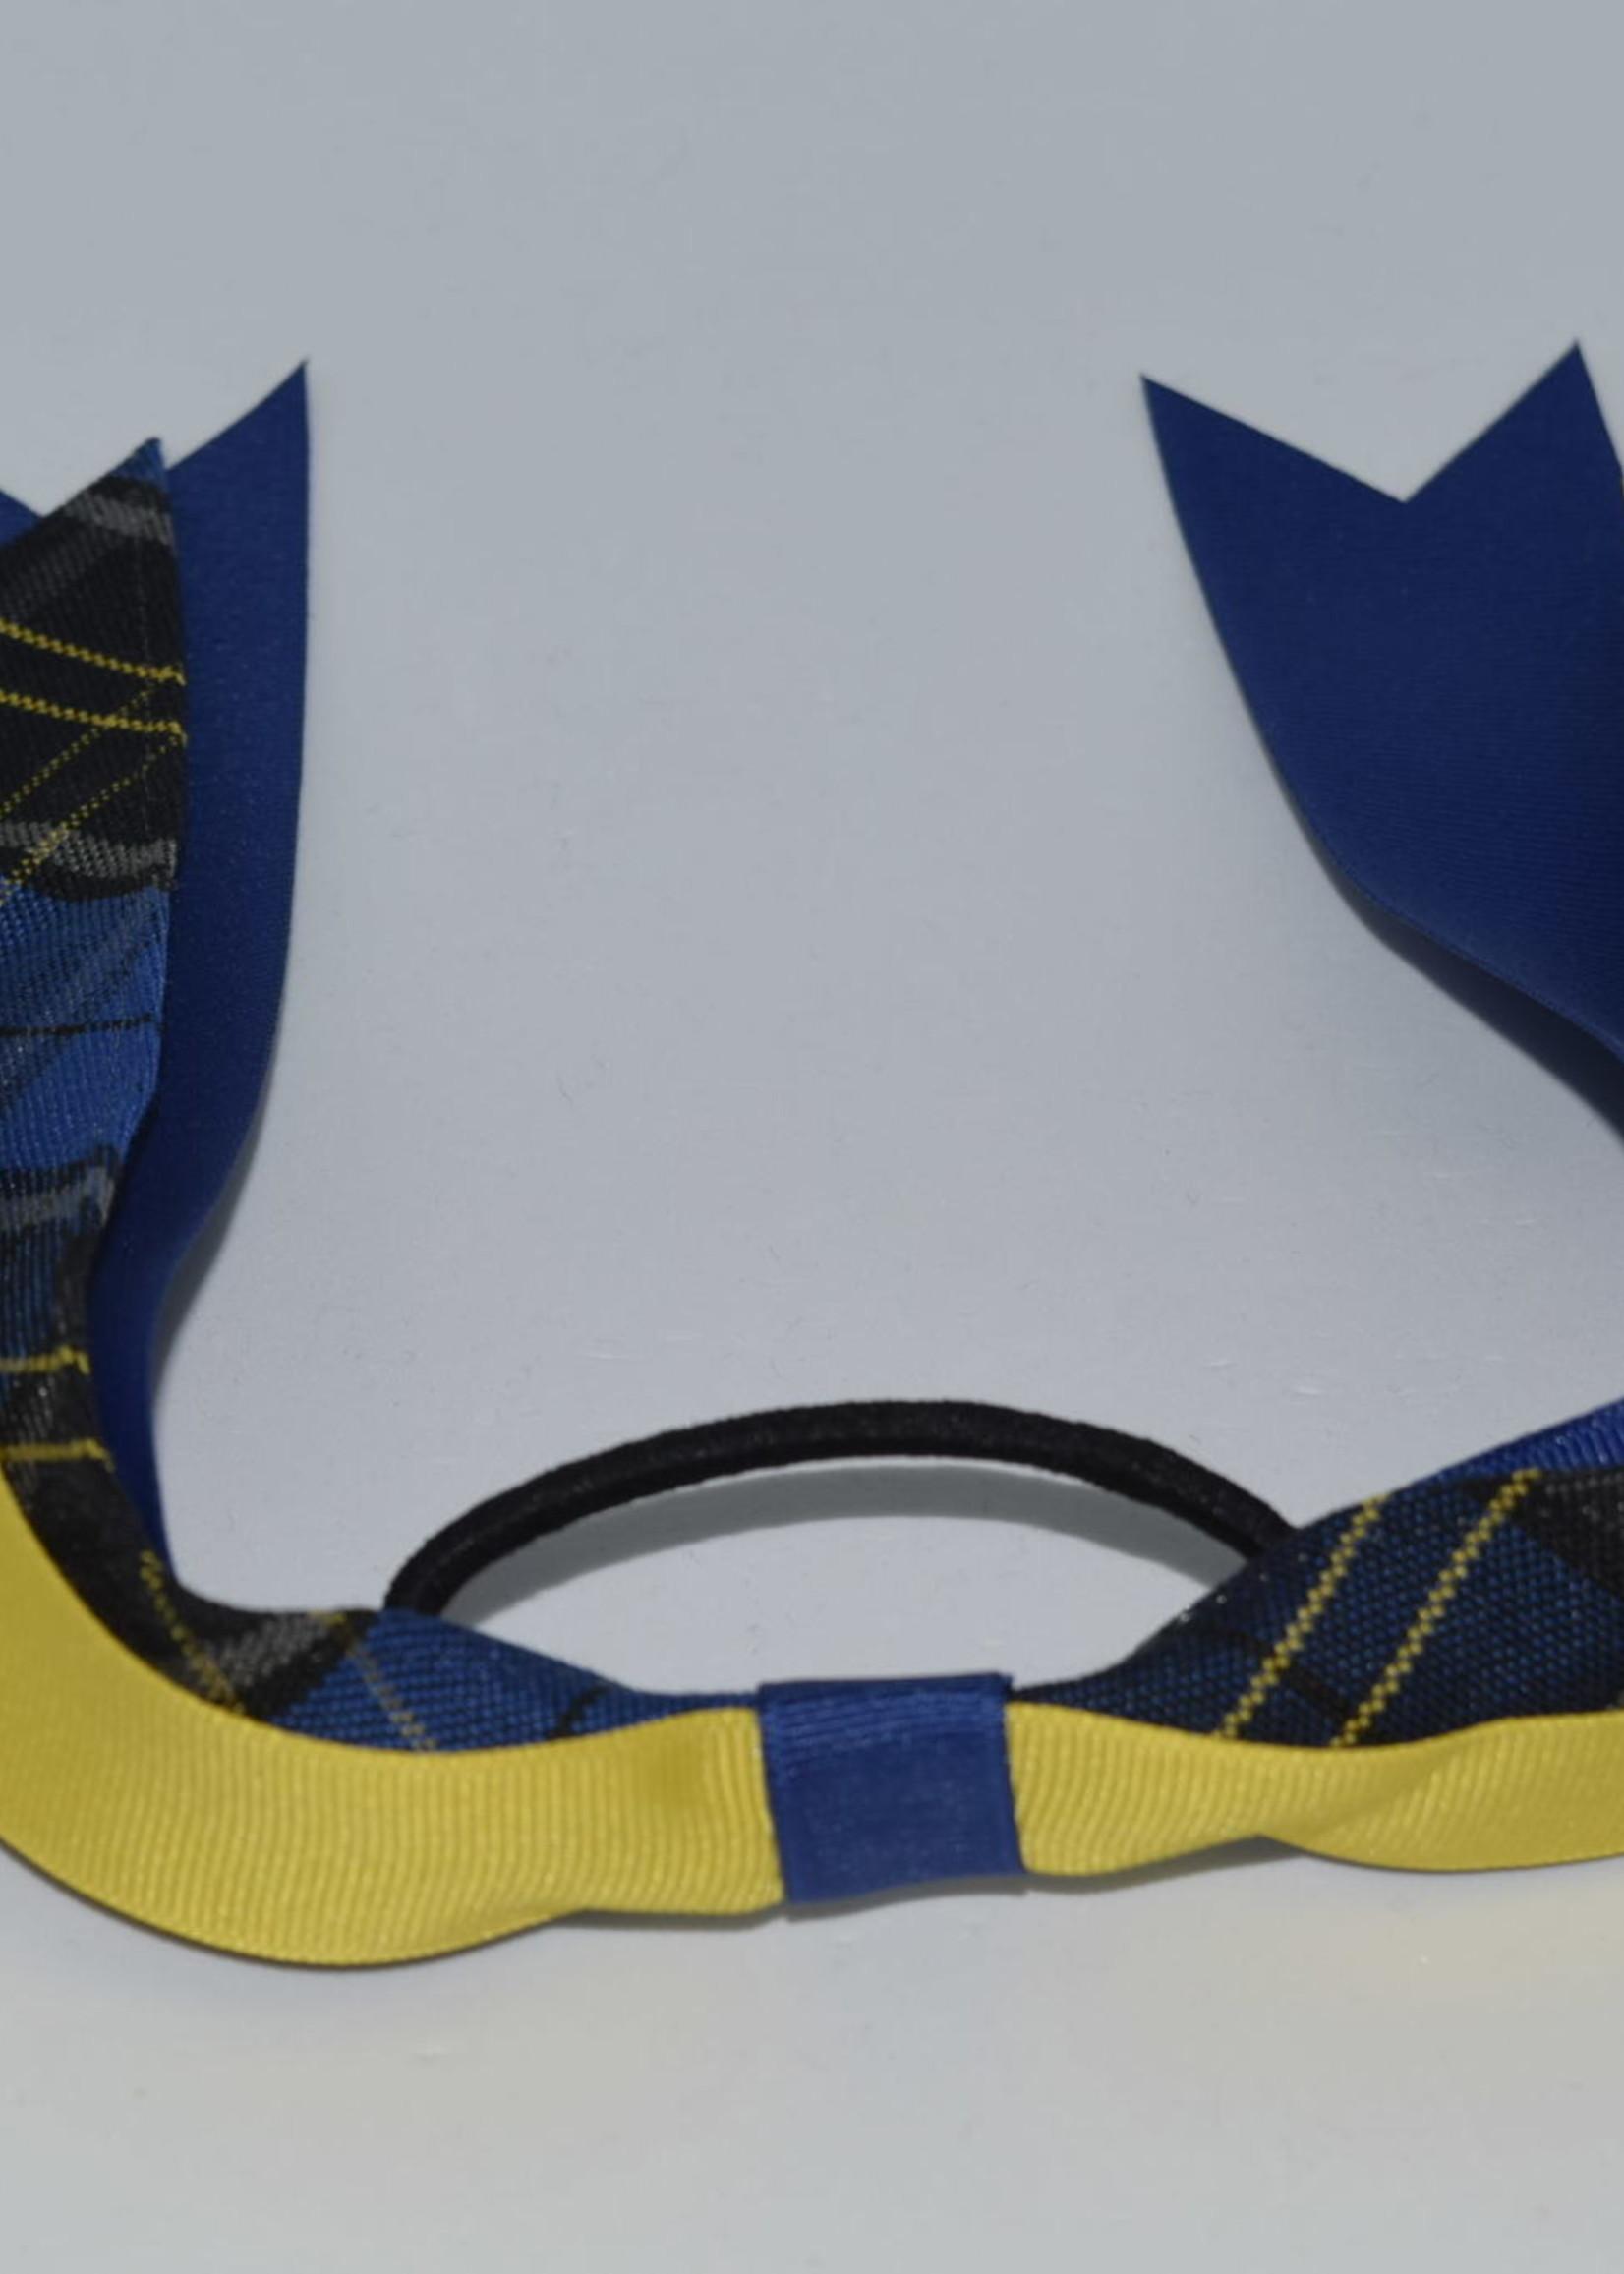 Wide Plaid & Grosgrain Ribbon Streamer Bow P92 ROY MAZ